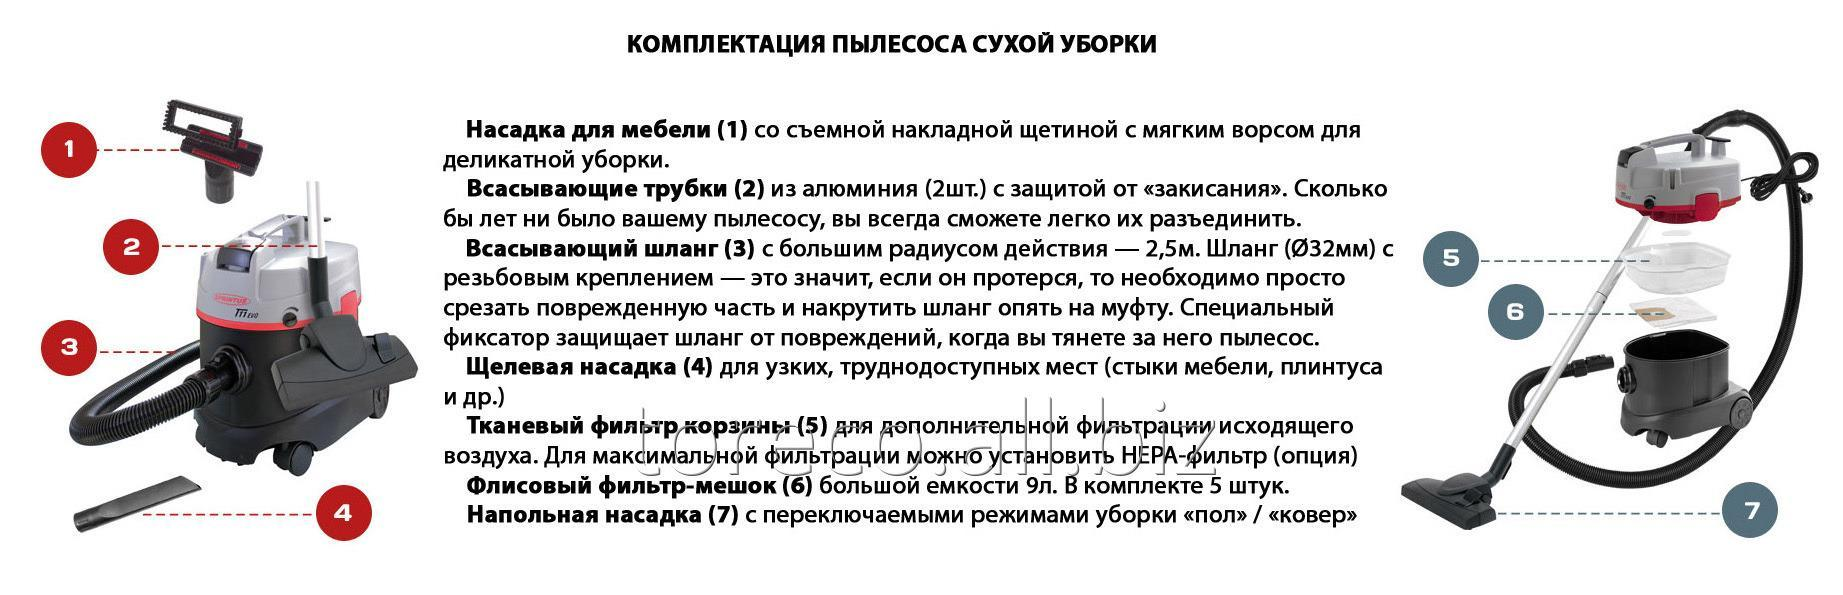 professionalnyj_pylesos_t11_evokod_111060